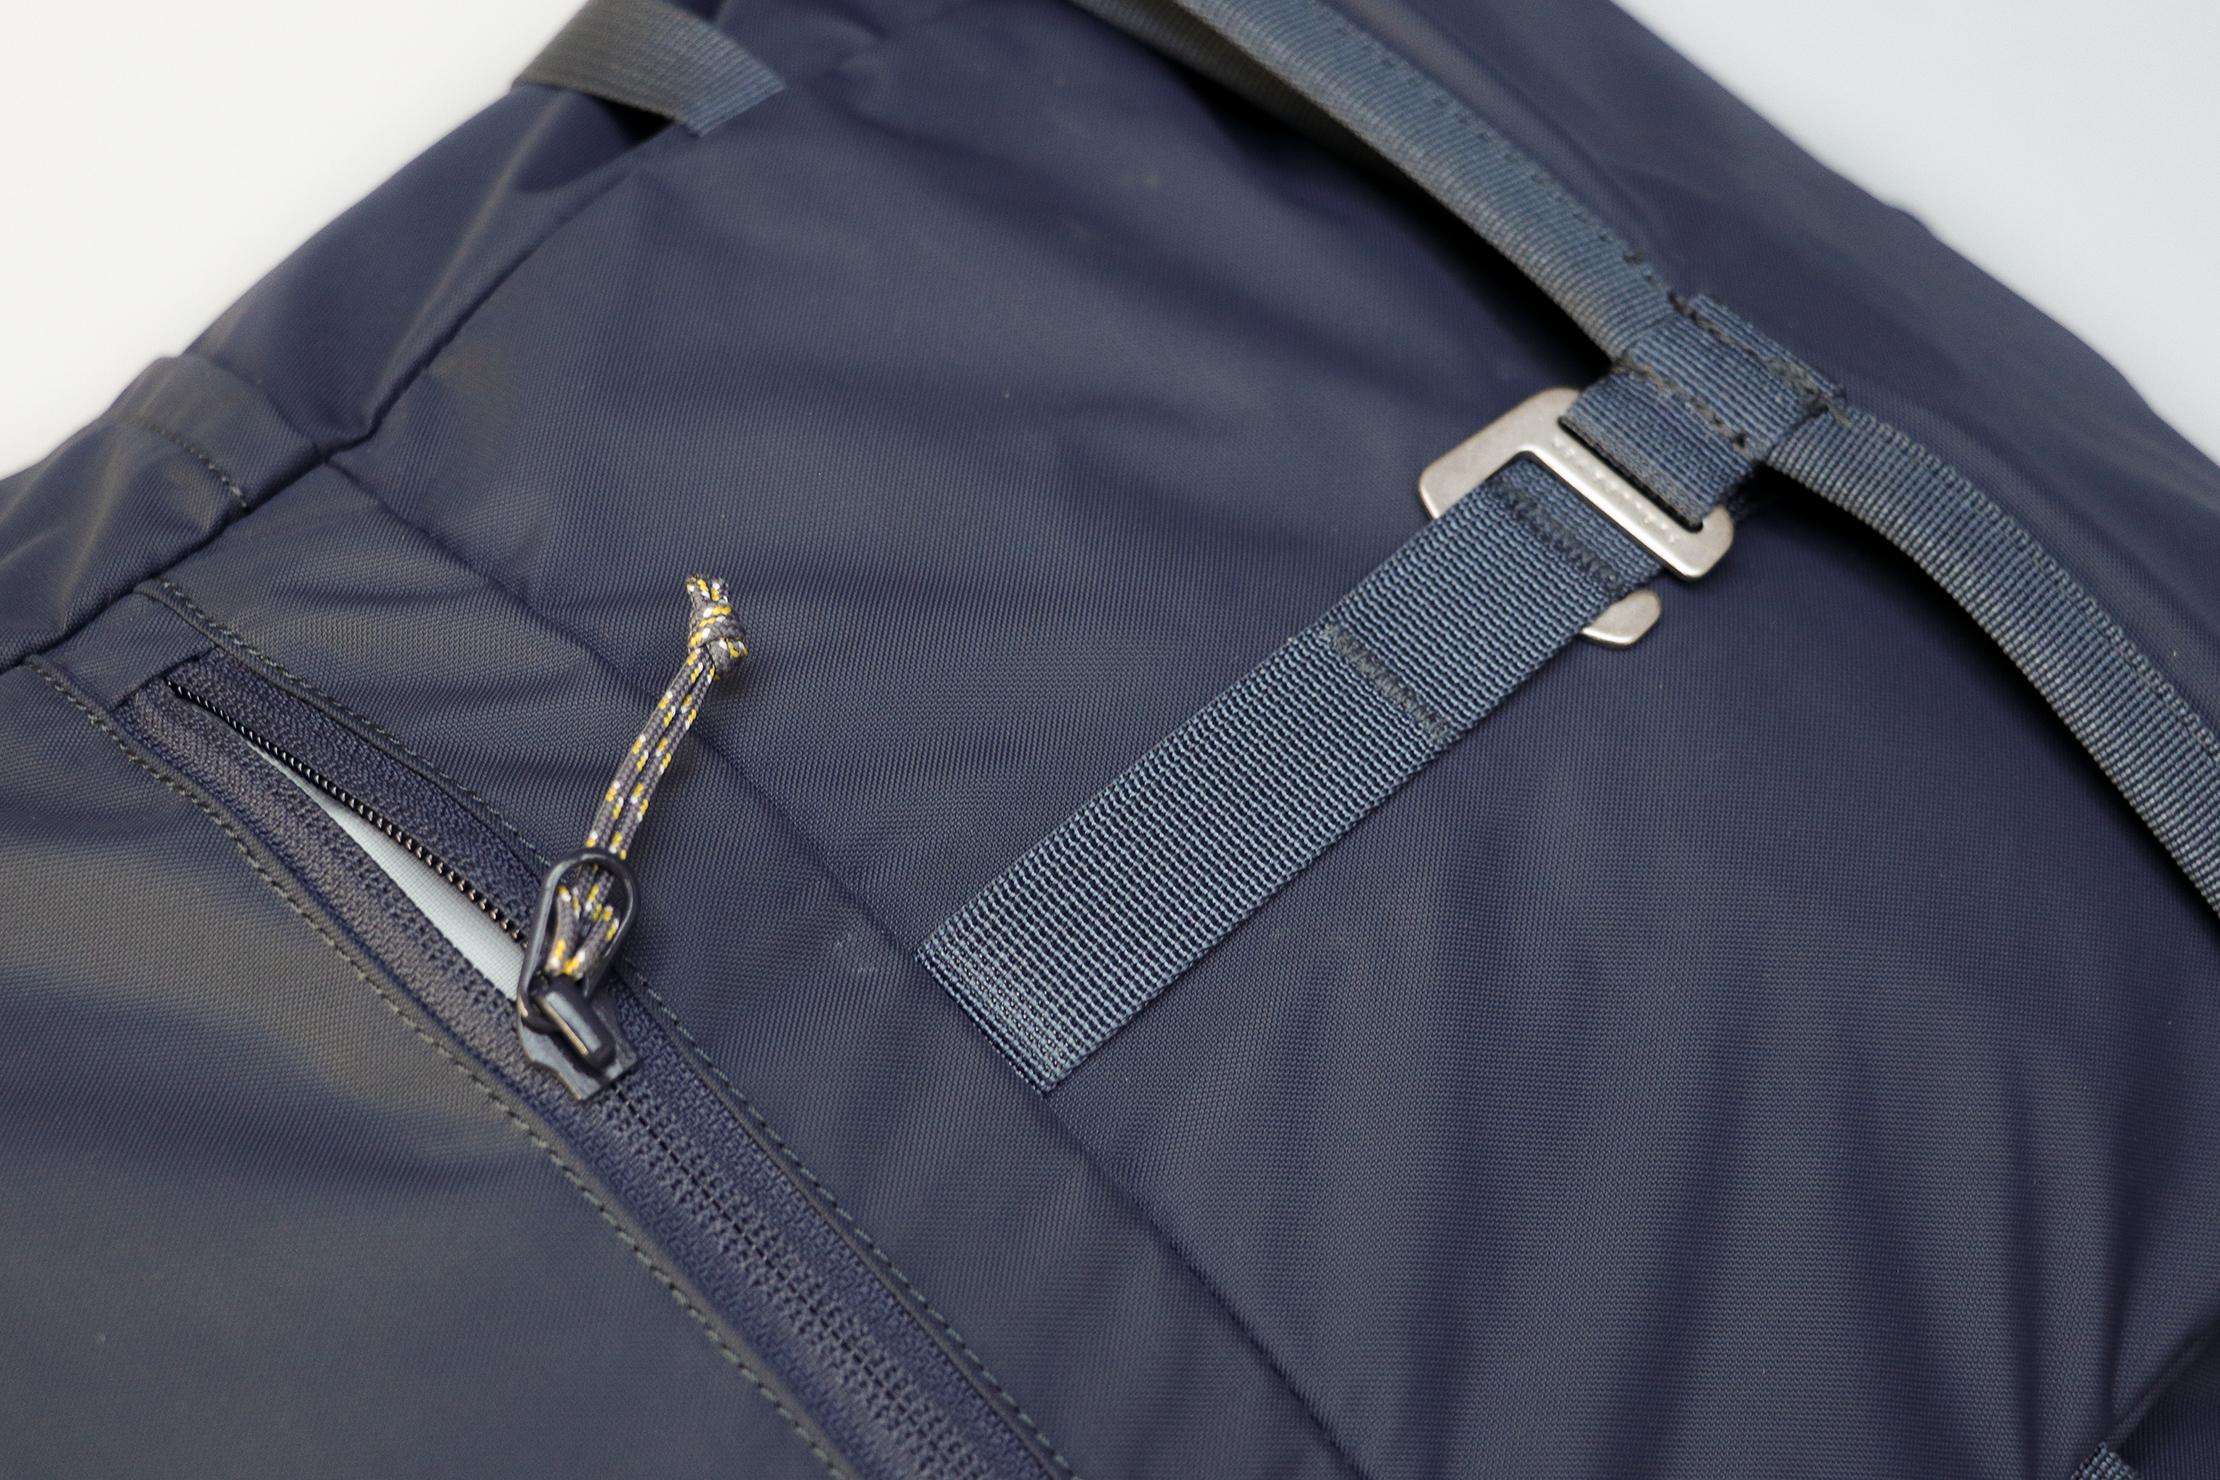 Fjallraven High Coast Foldsack 24 Zippers and Hardware